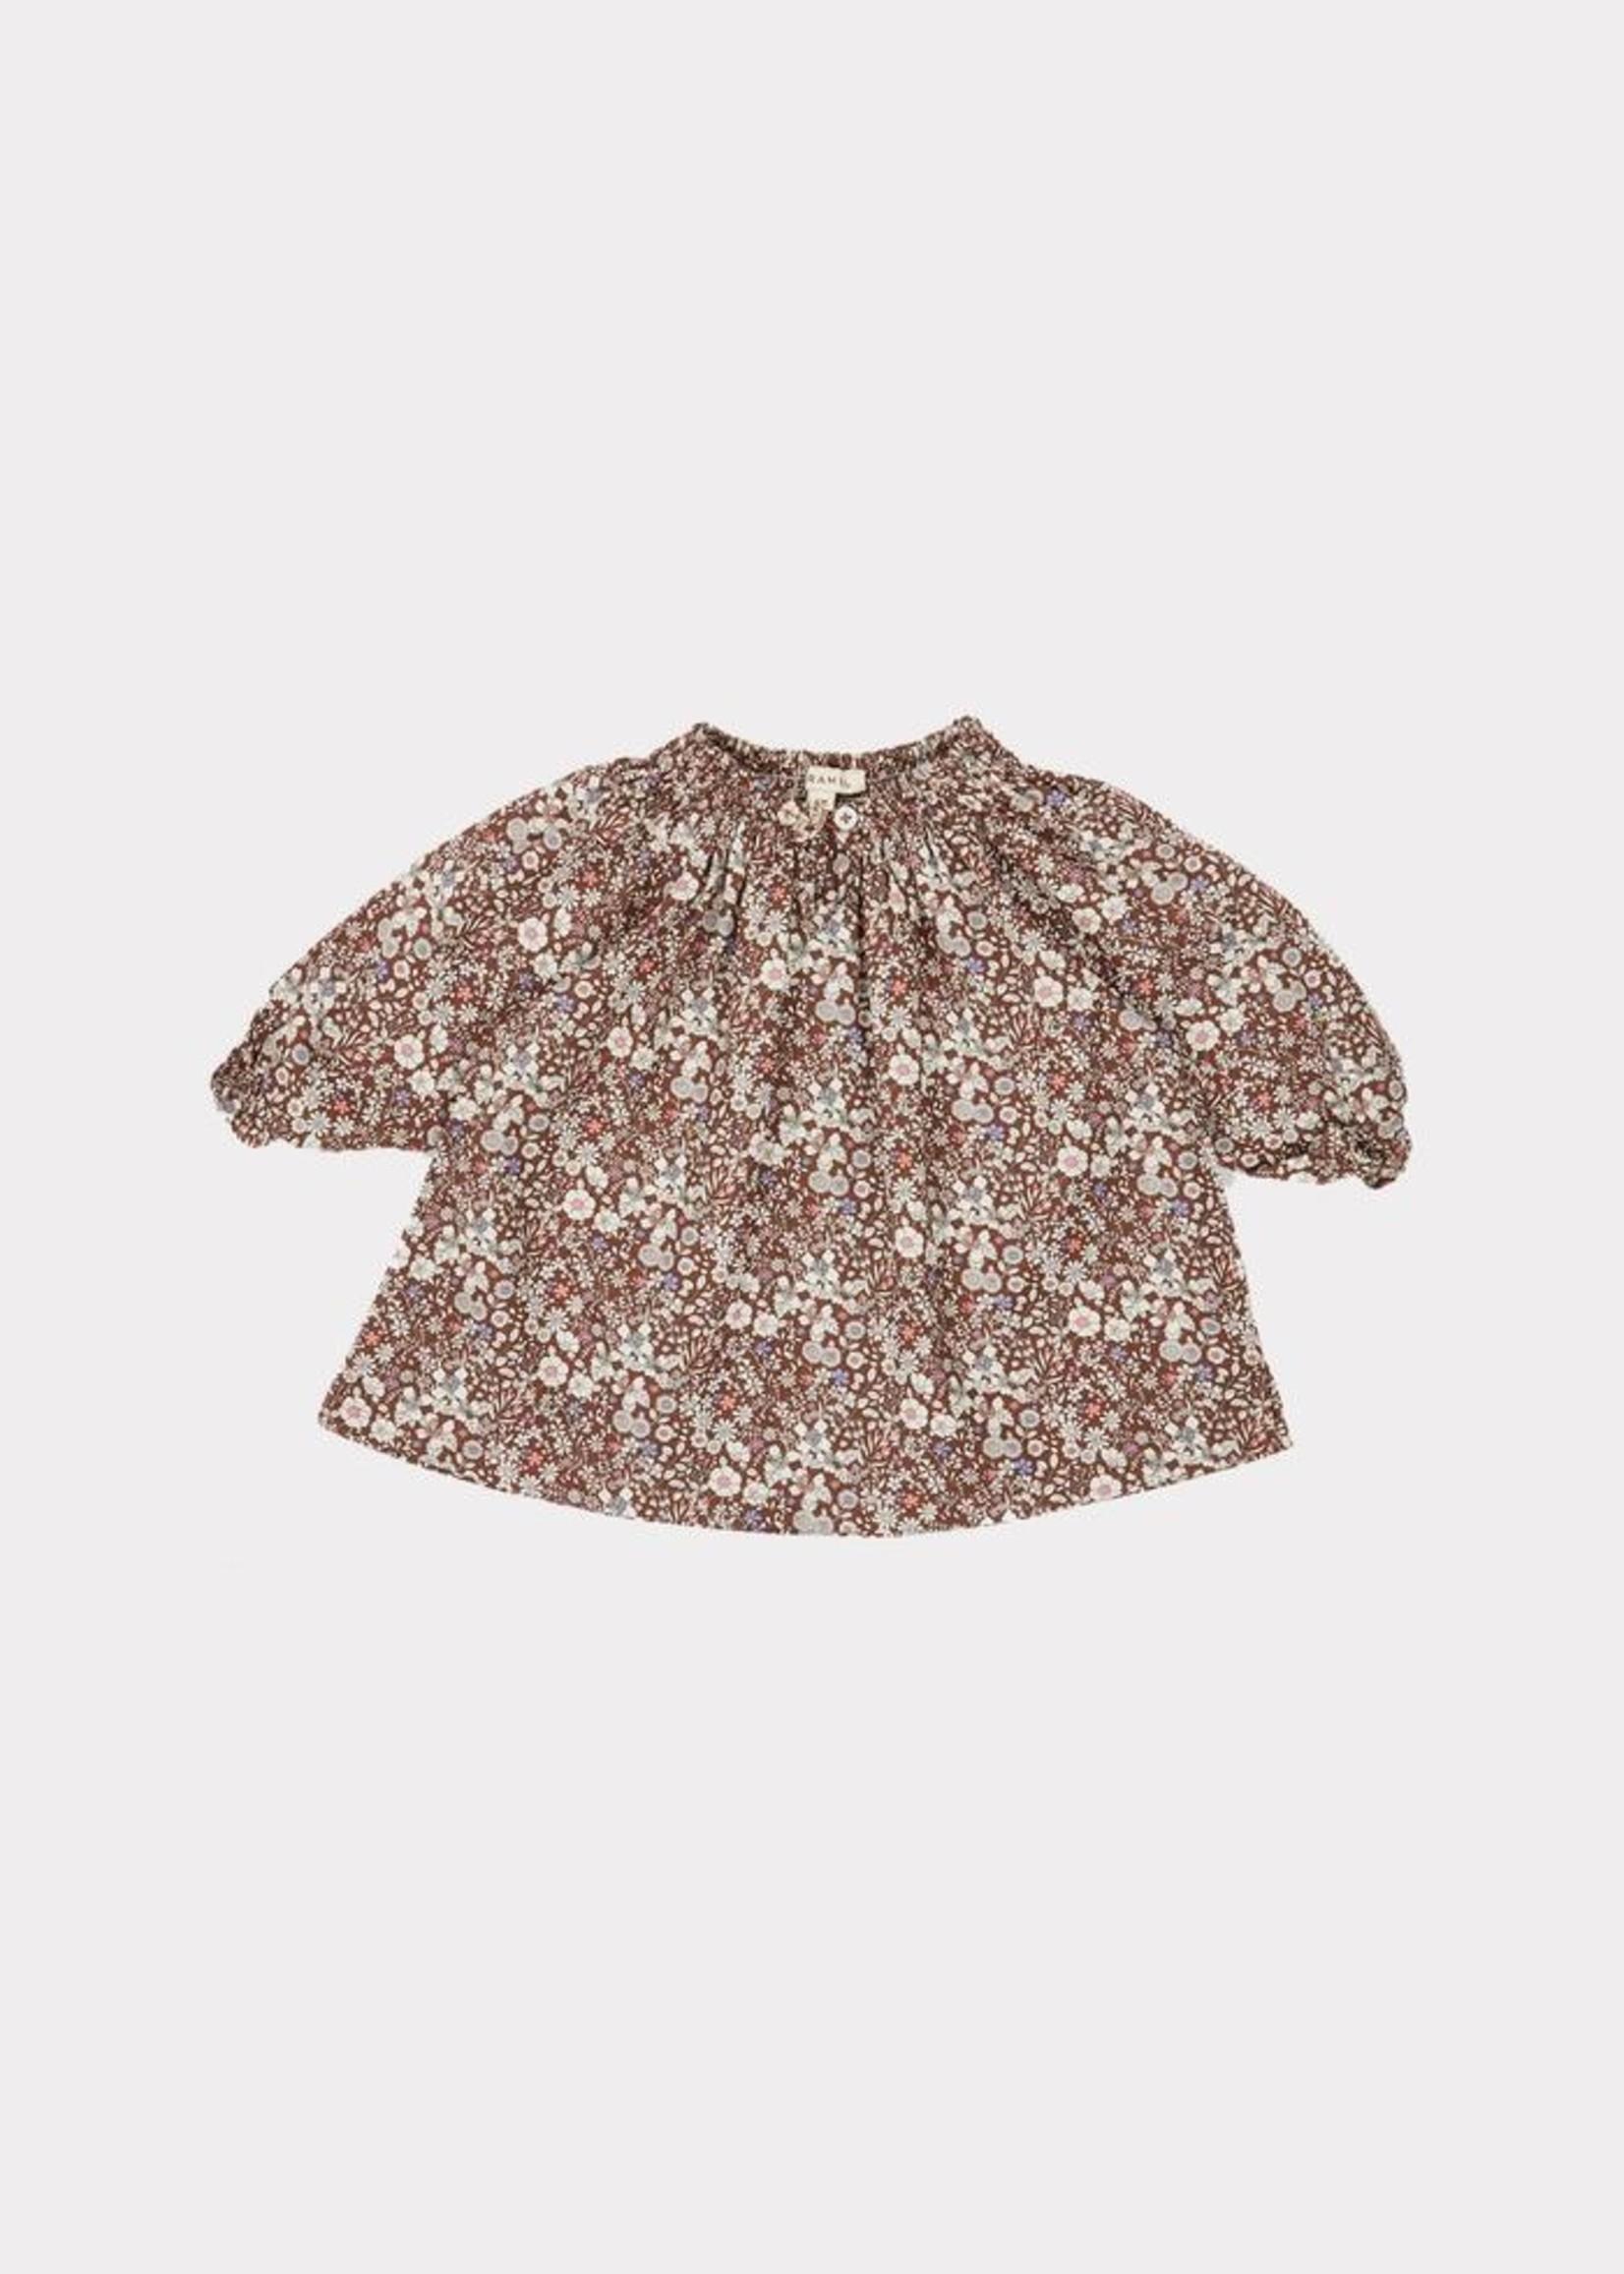 Caramel Caramel-ss21 AROWANA baby DRESS S21DF Brown 12m